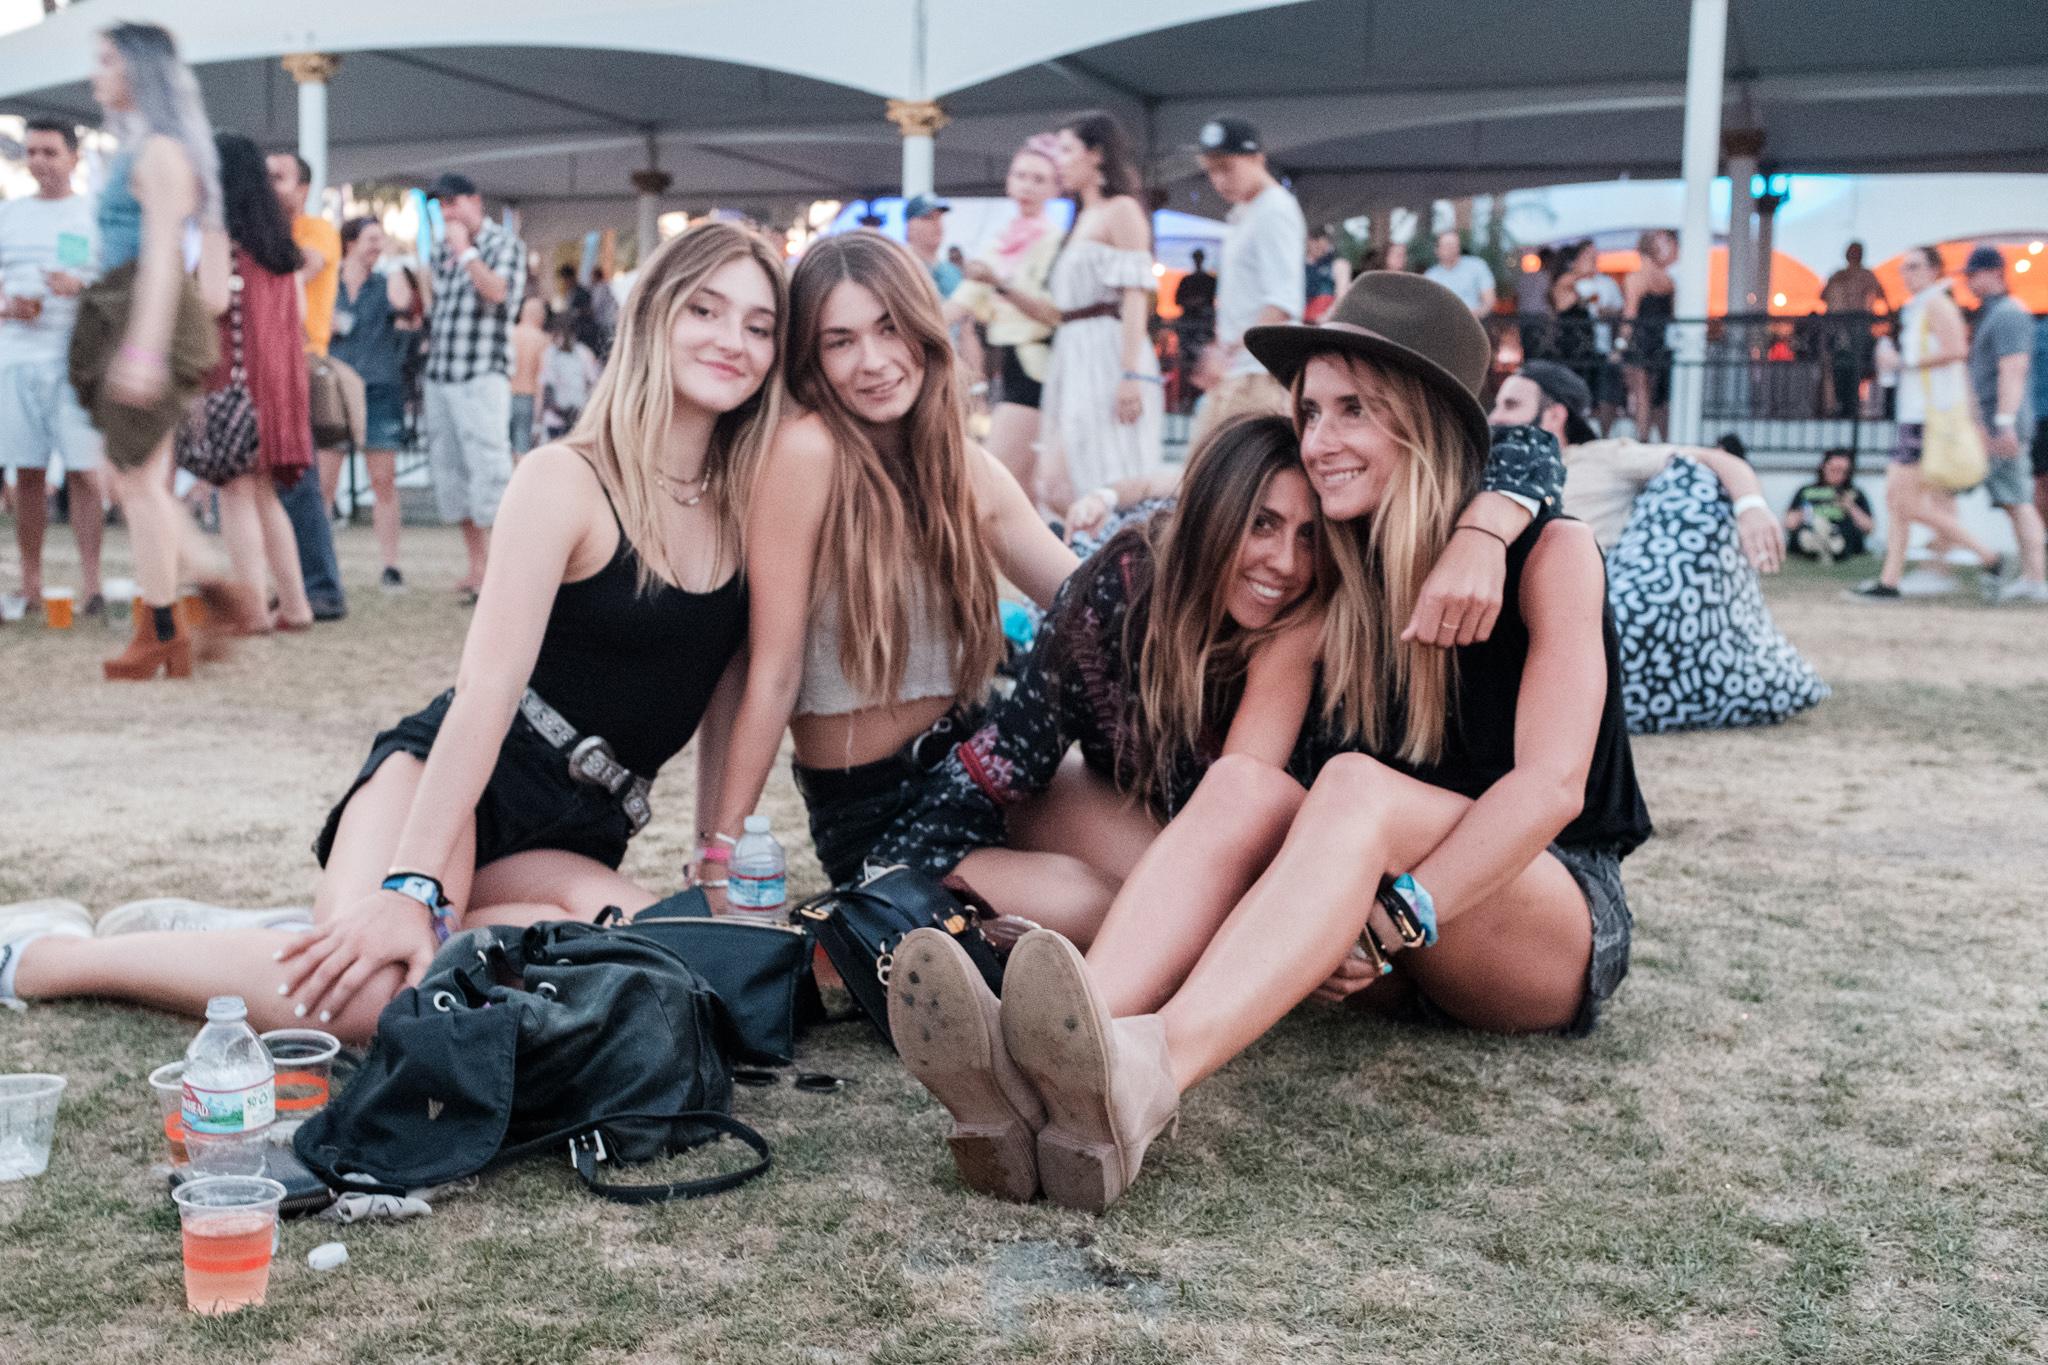 170423 Coachella 17 w2 2117.jpg